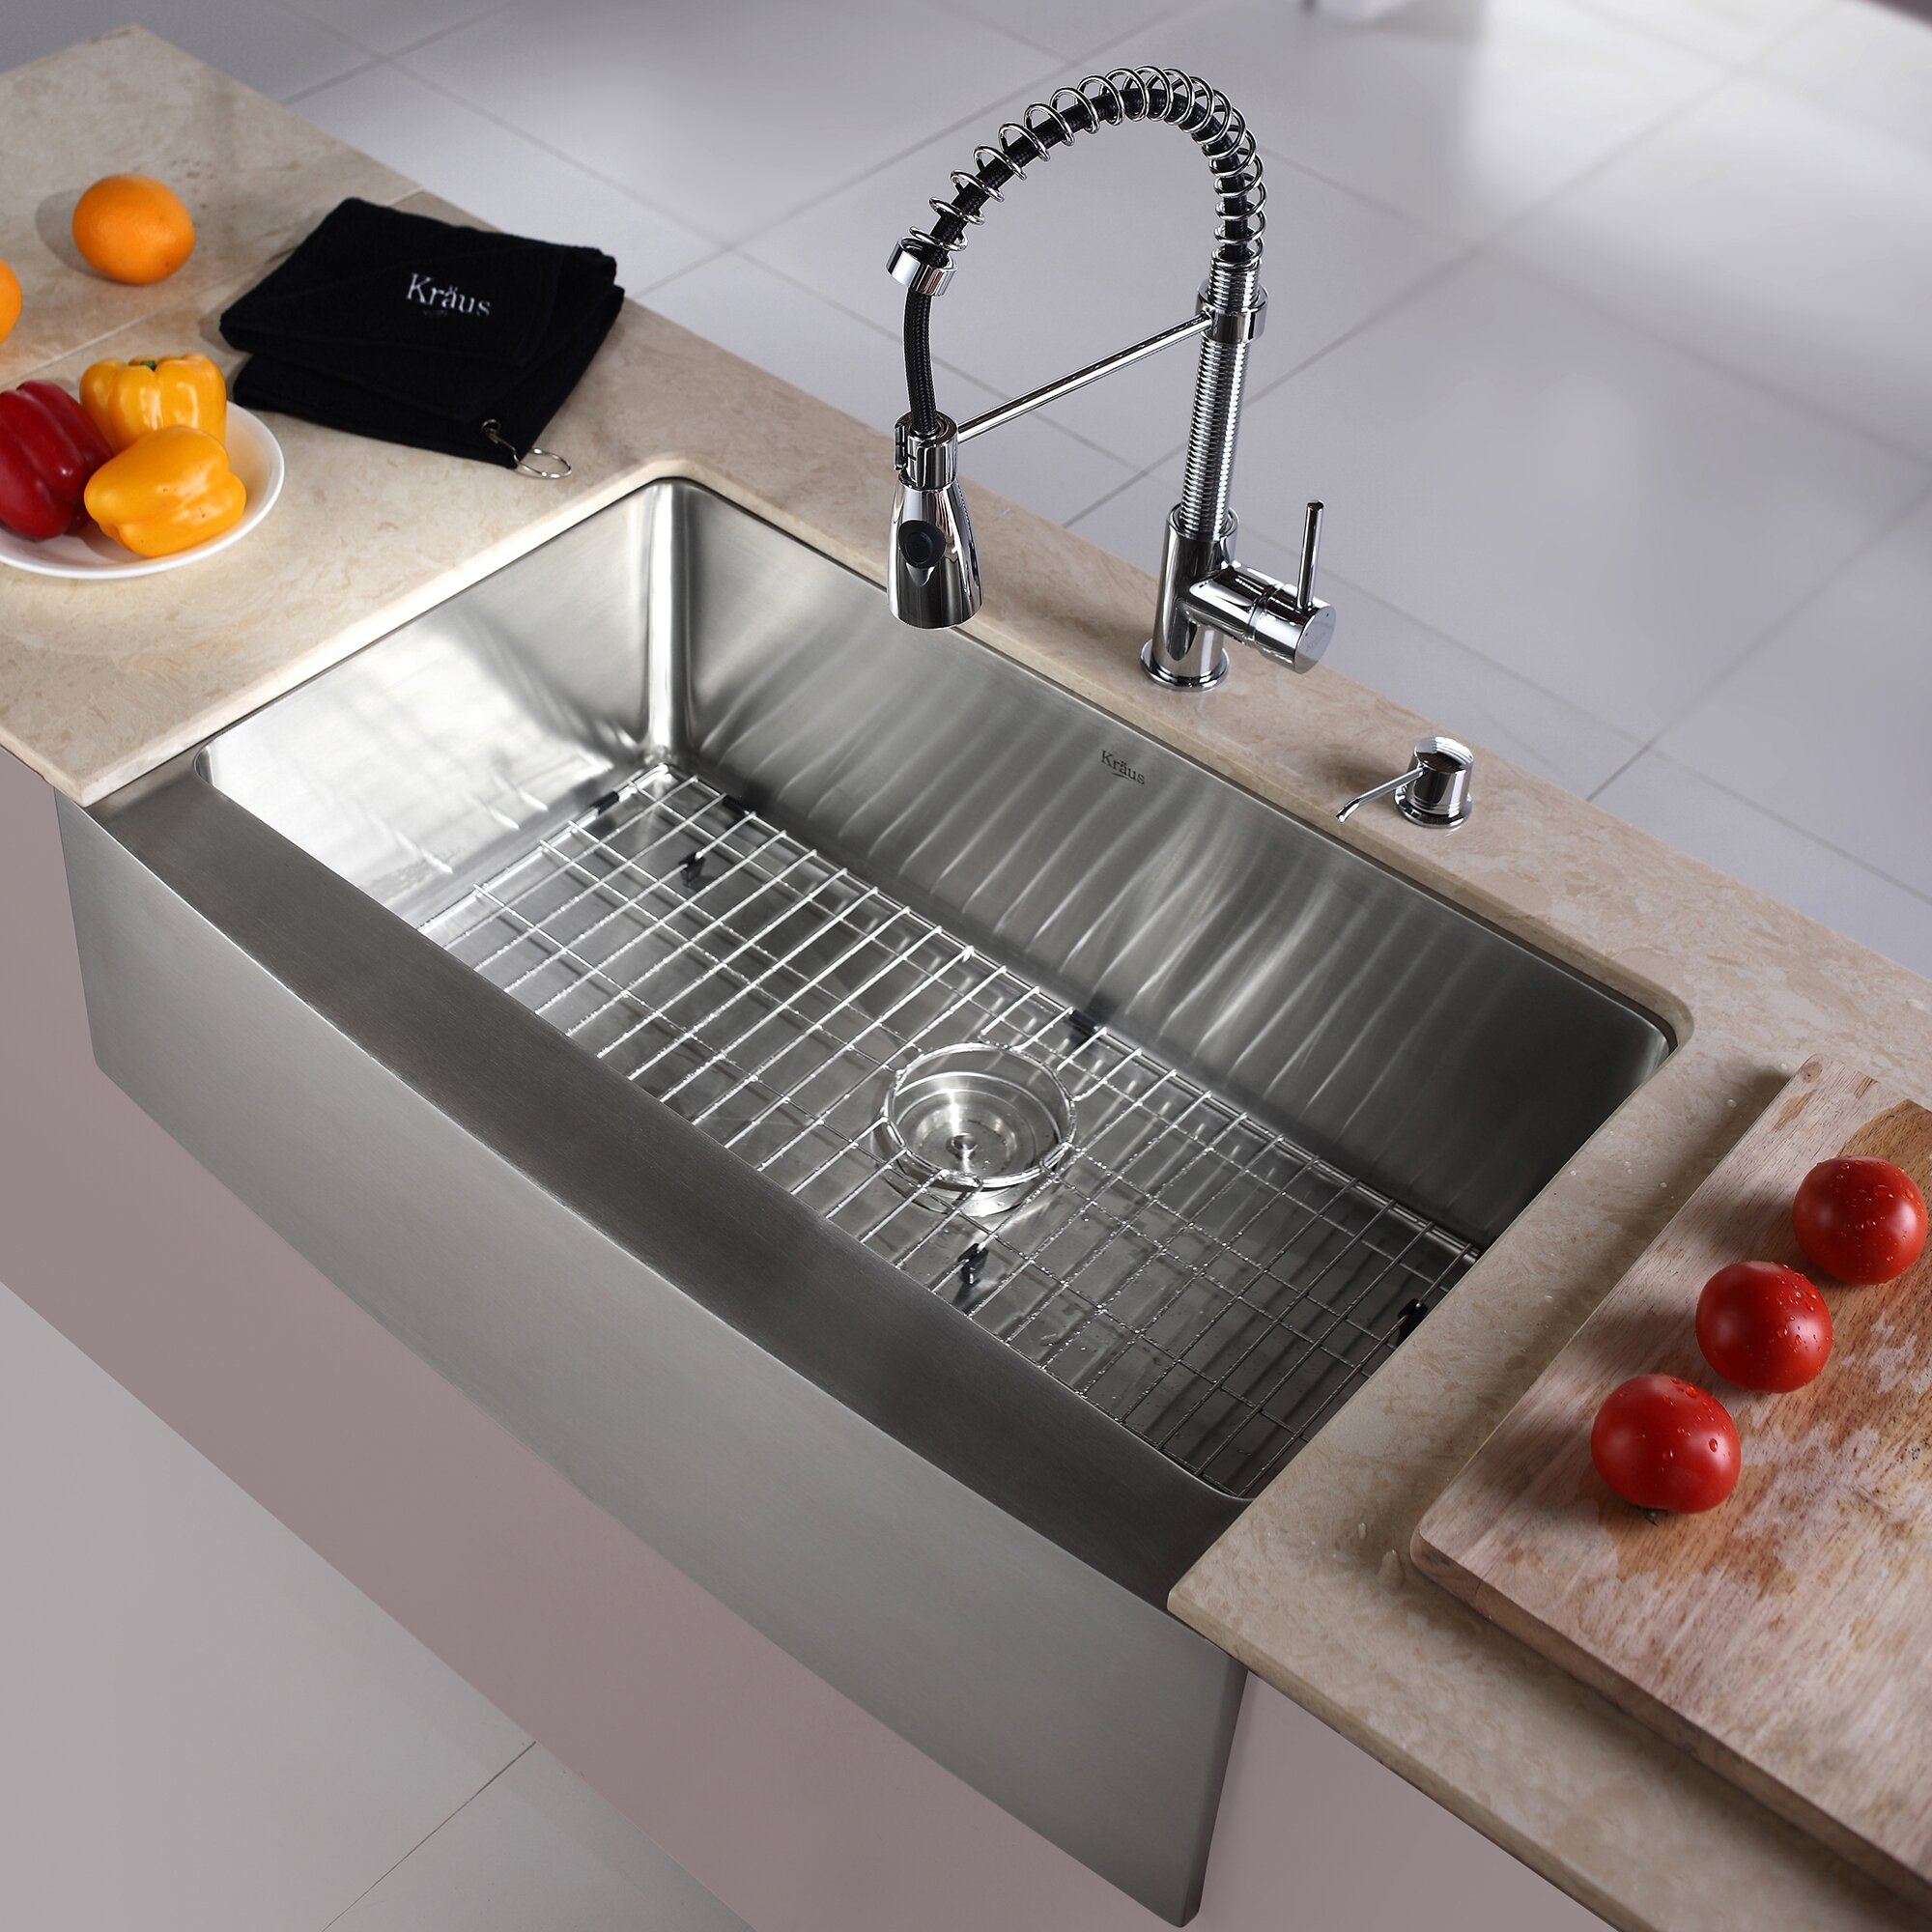 kitchen combos 33 x 21 single basin farmhouseapron kitchen sink with faucet - Apron Kitchen Sinks